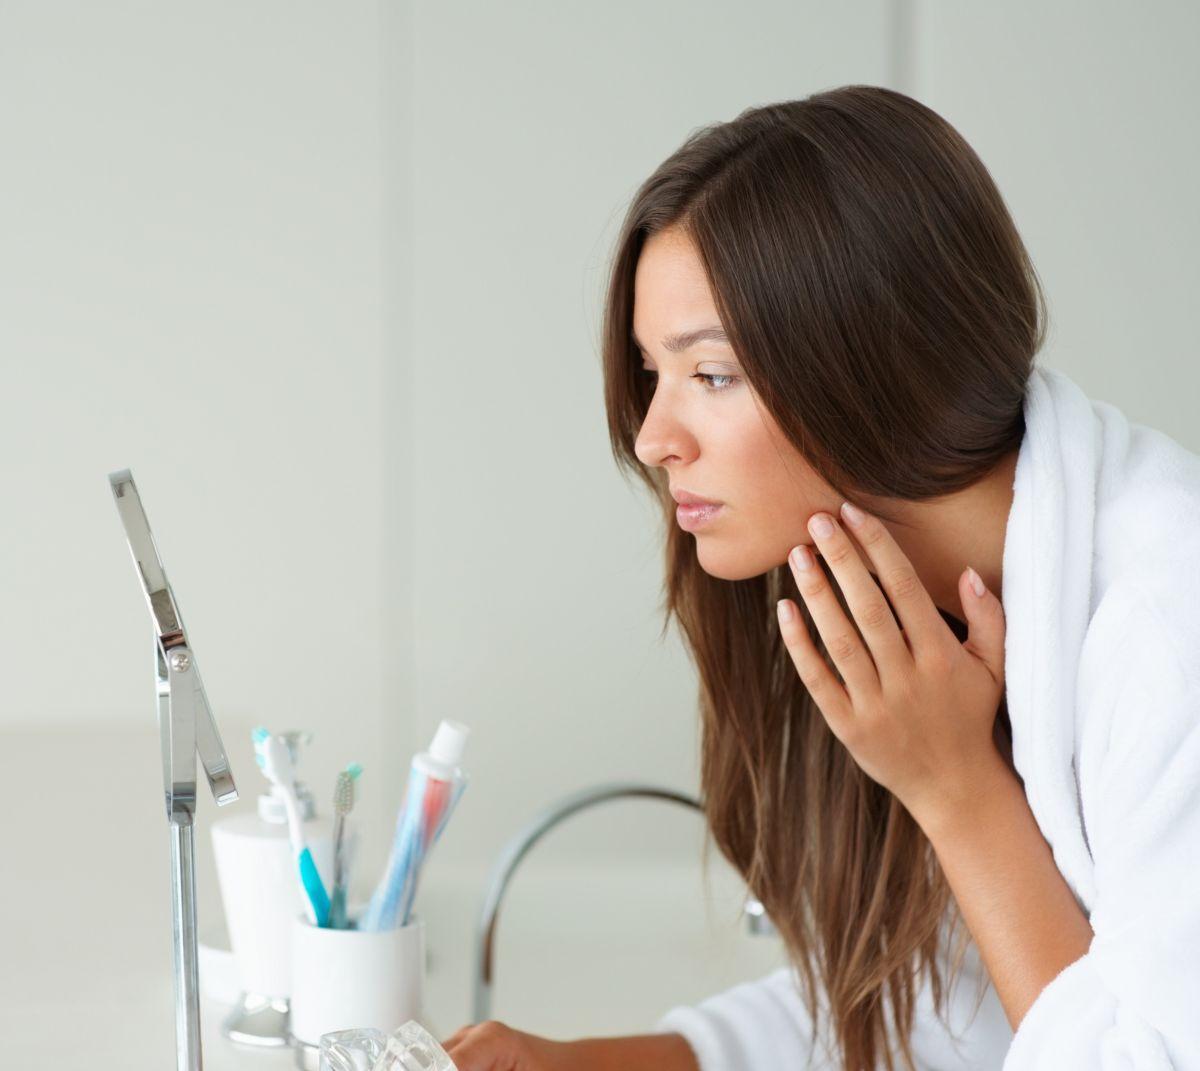 hpv vaccine skin cancer)